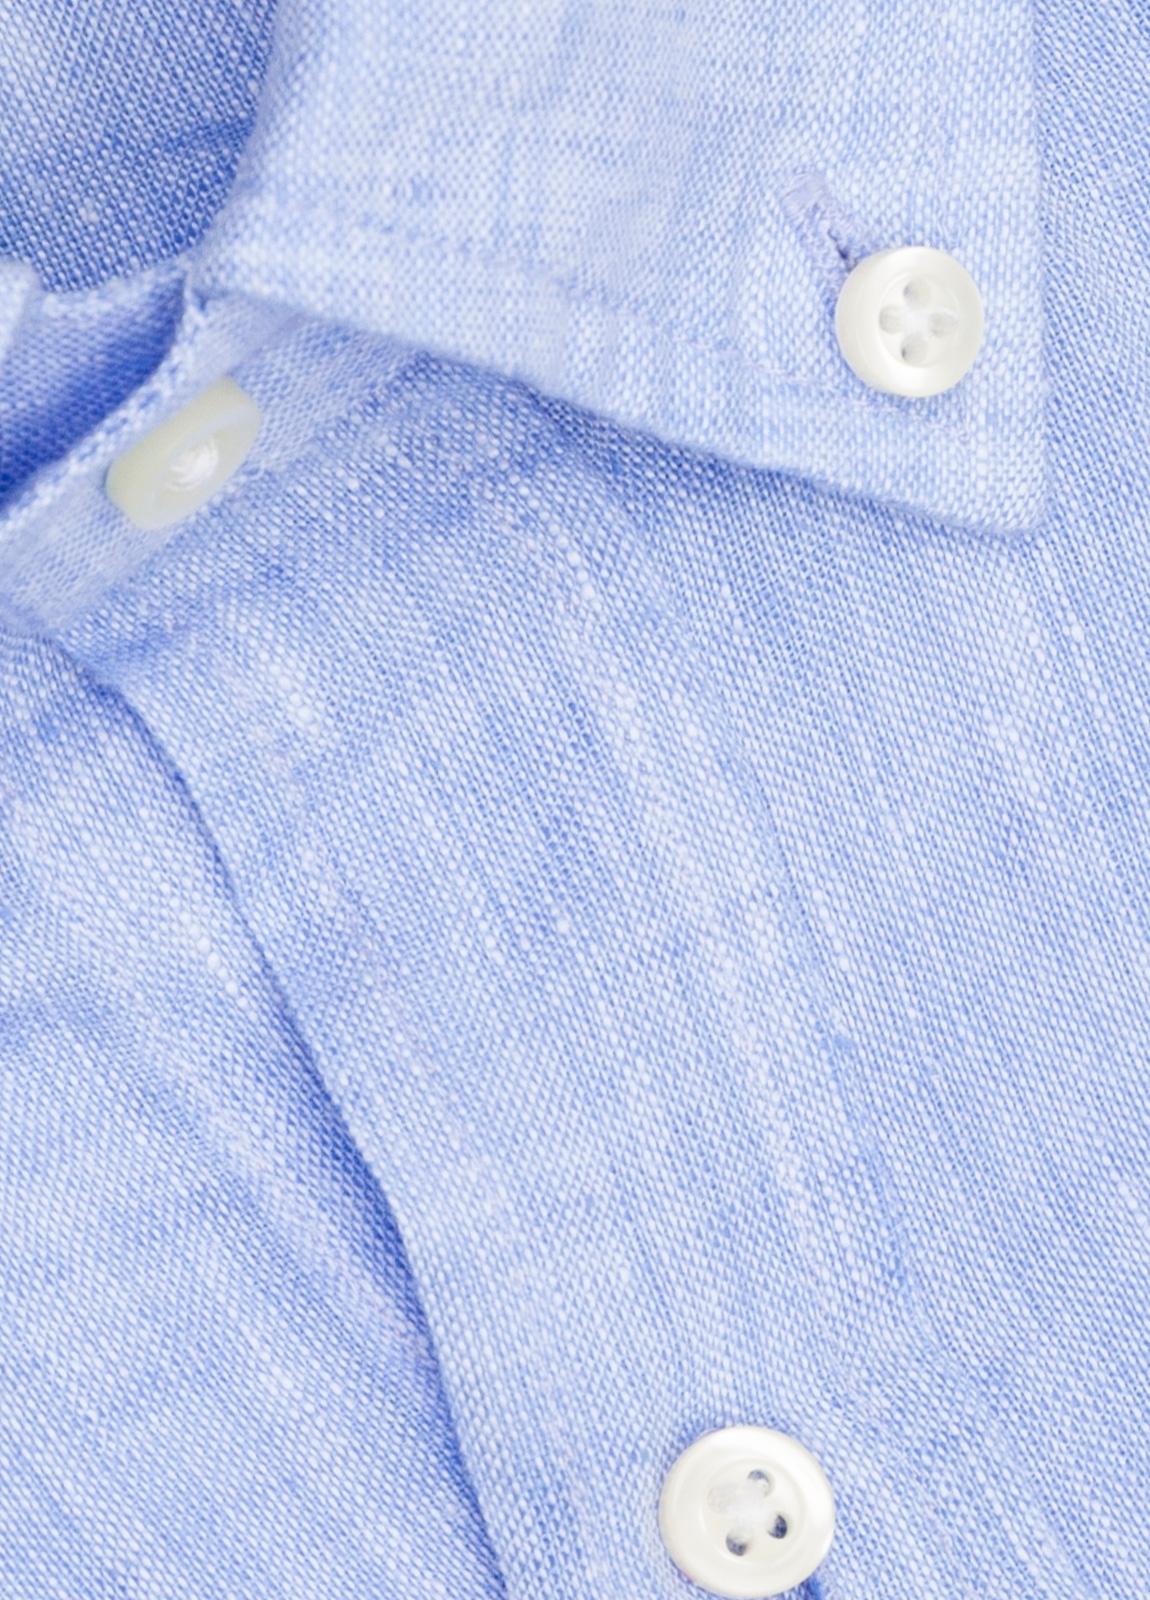 Camisa M/Corta sport FUREST COLECCIÓN Regular FIT Lino azul - Ítem1